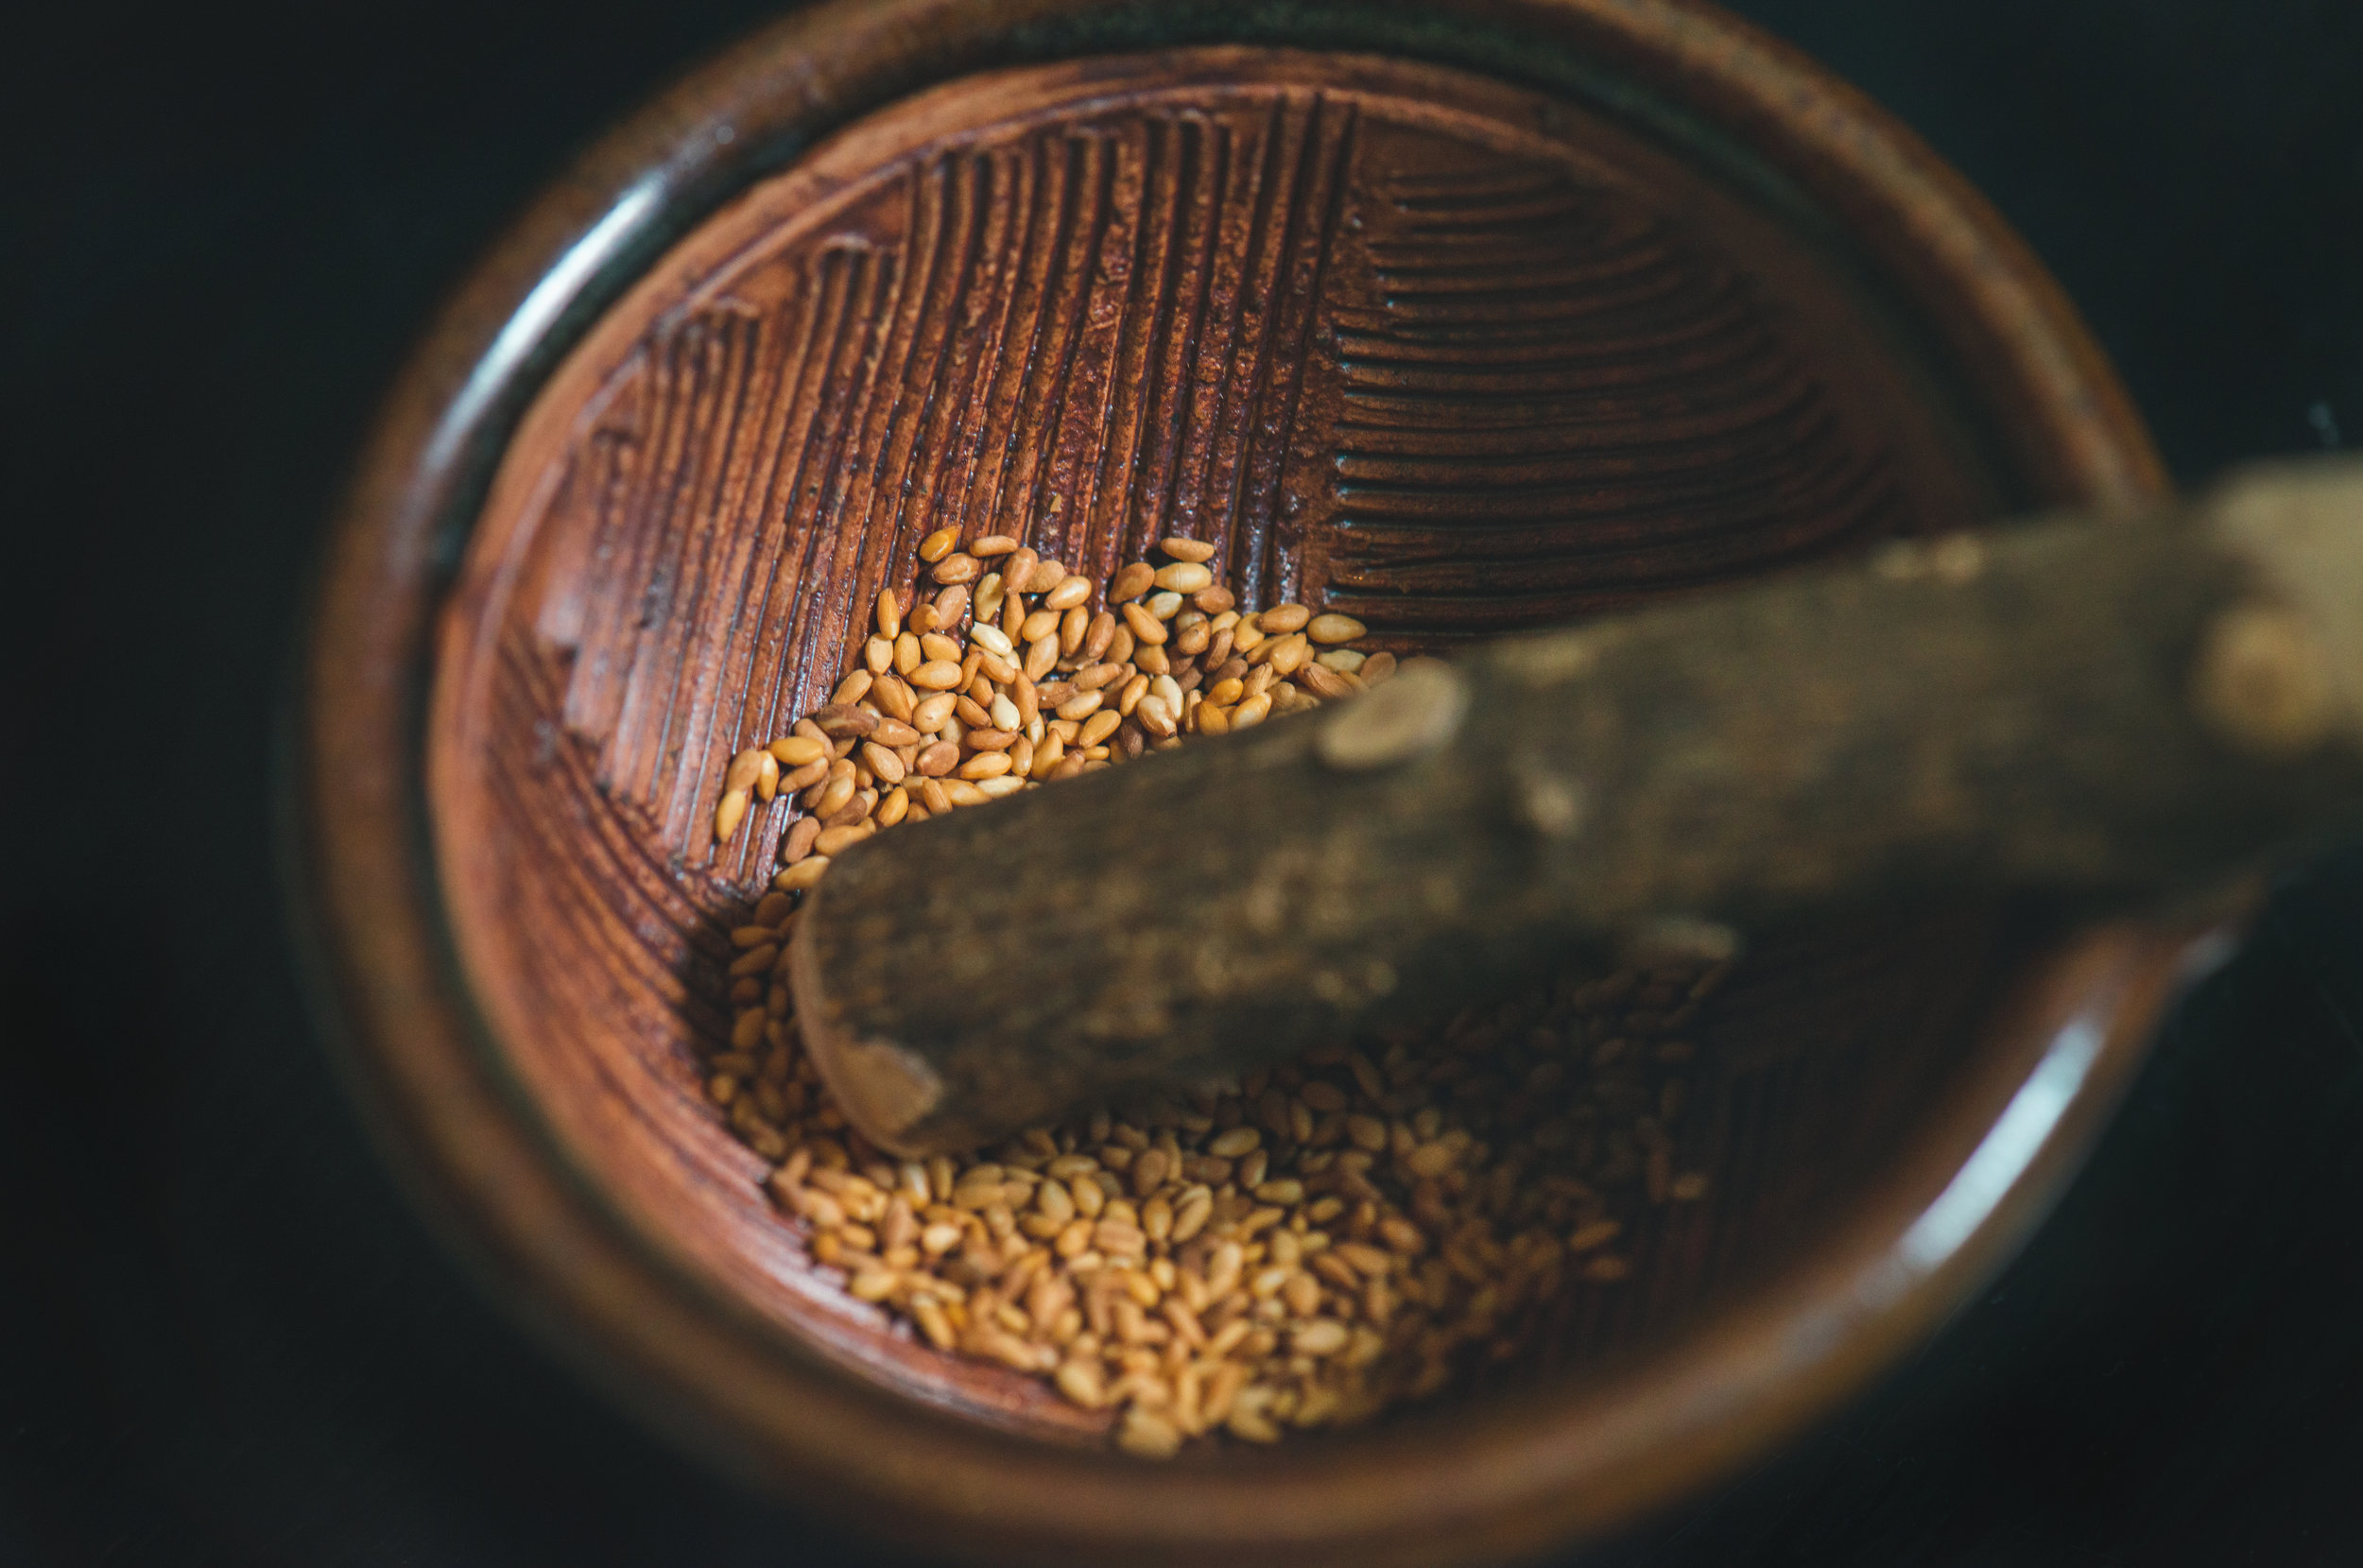 Sesame seeds  are an excellent source of copper, a very good source of manganese, and a good source of calcium, phosphorus, magnesium, iron, zinc, molybdenum, Vitamin A, several B vitamins, selenium and dietary fiber.